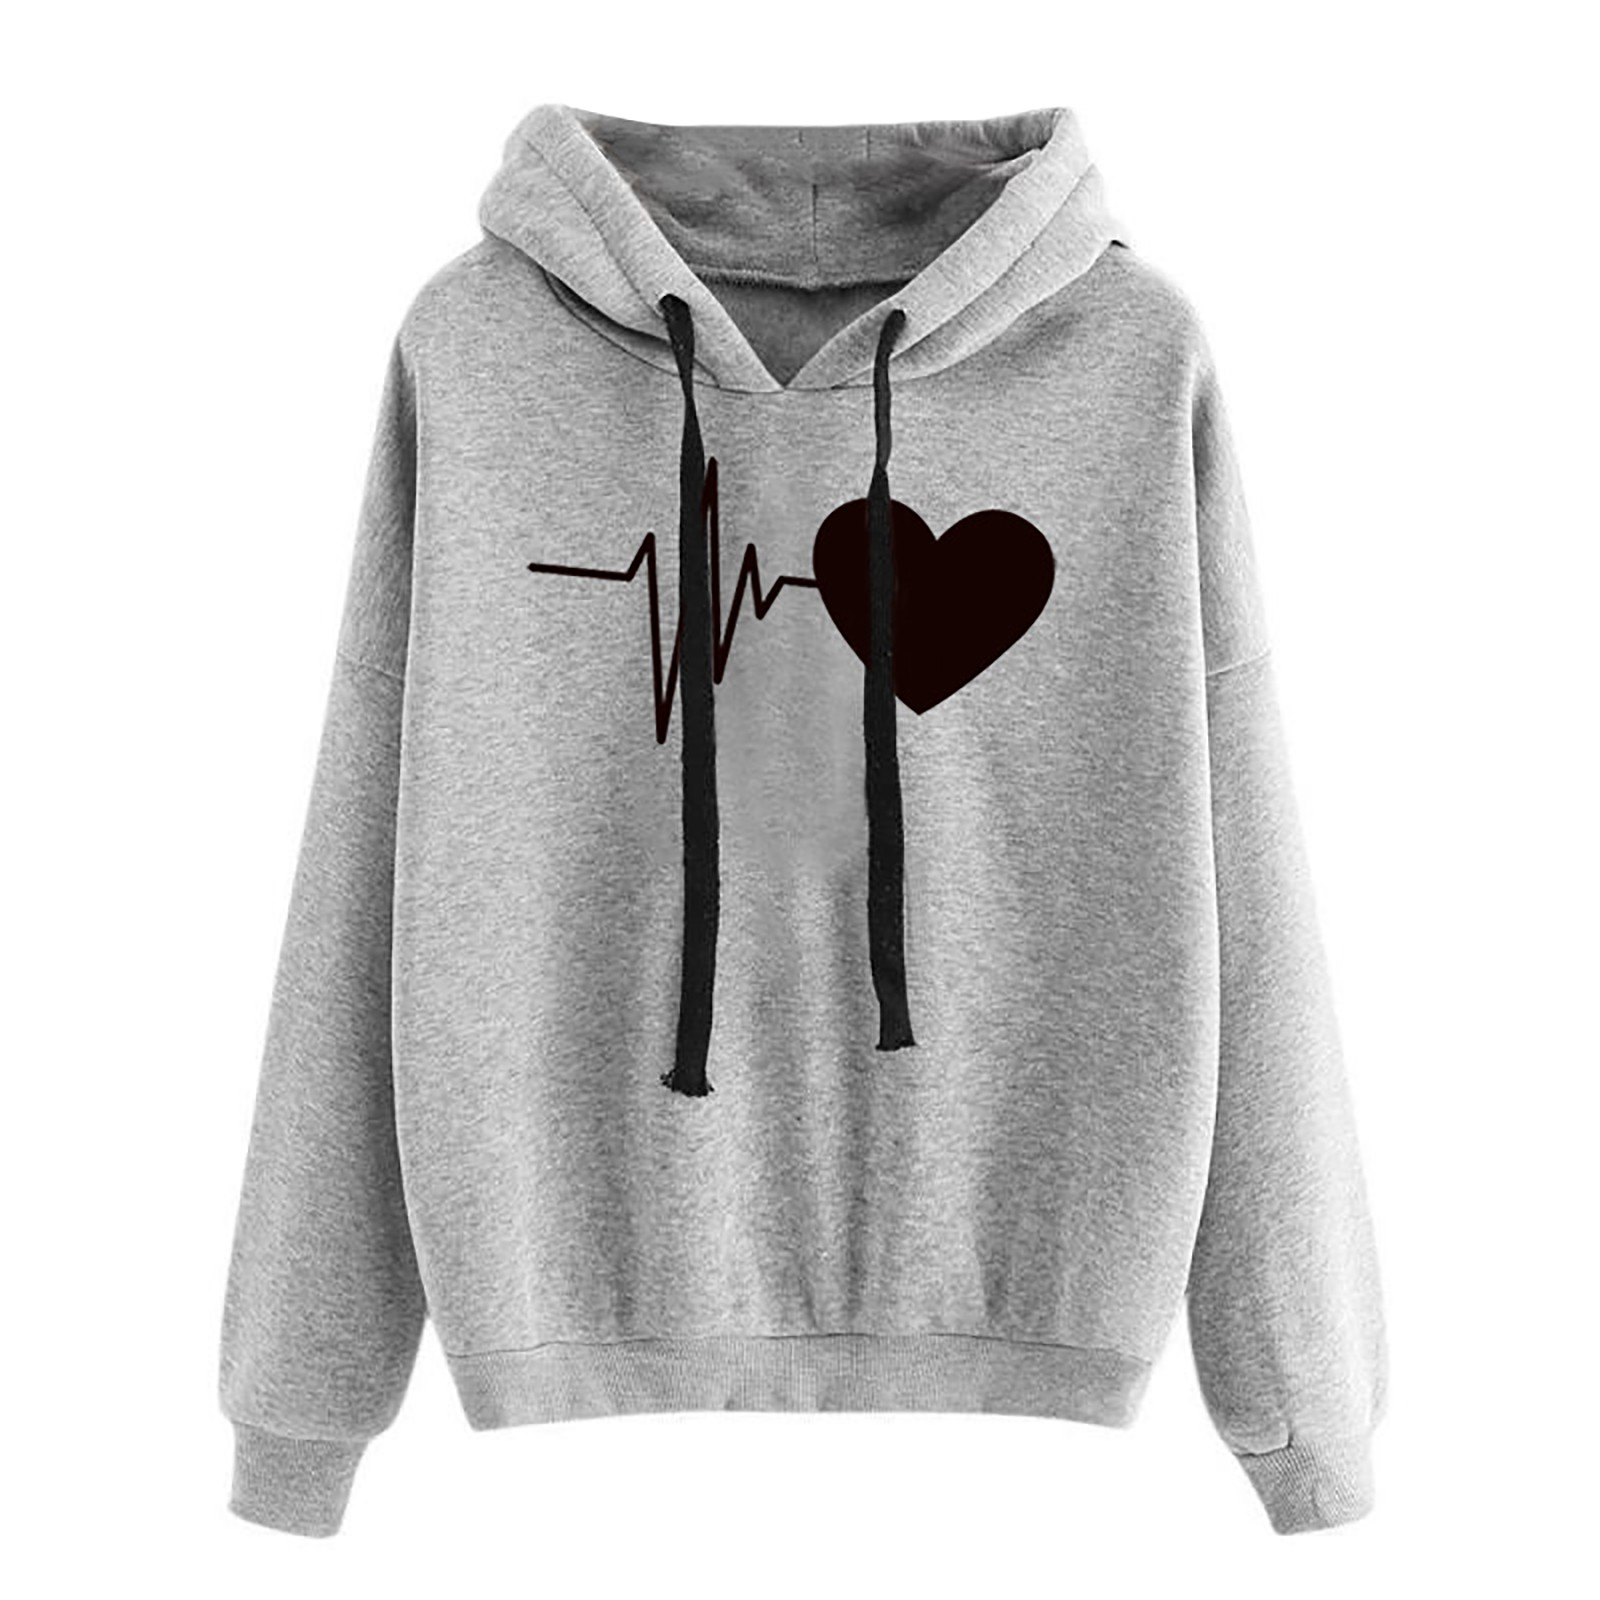 Women Hoodies Casual Love Print Solid Loose Drawstring Sweatshirt Long Sleeve Hooded 2020 Spring Autumn Female Pullover Tops 2